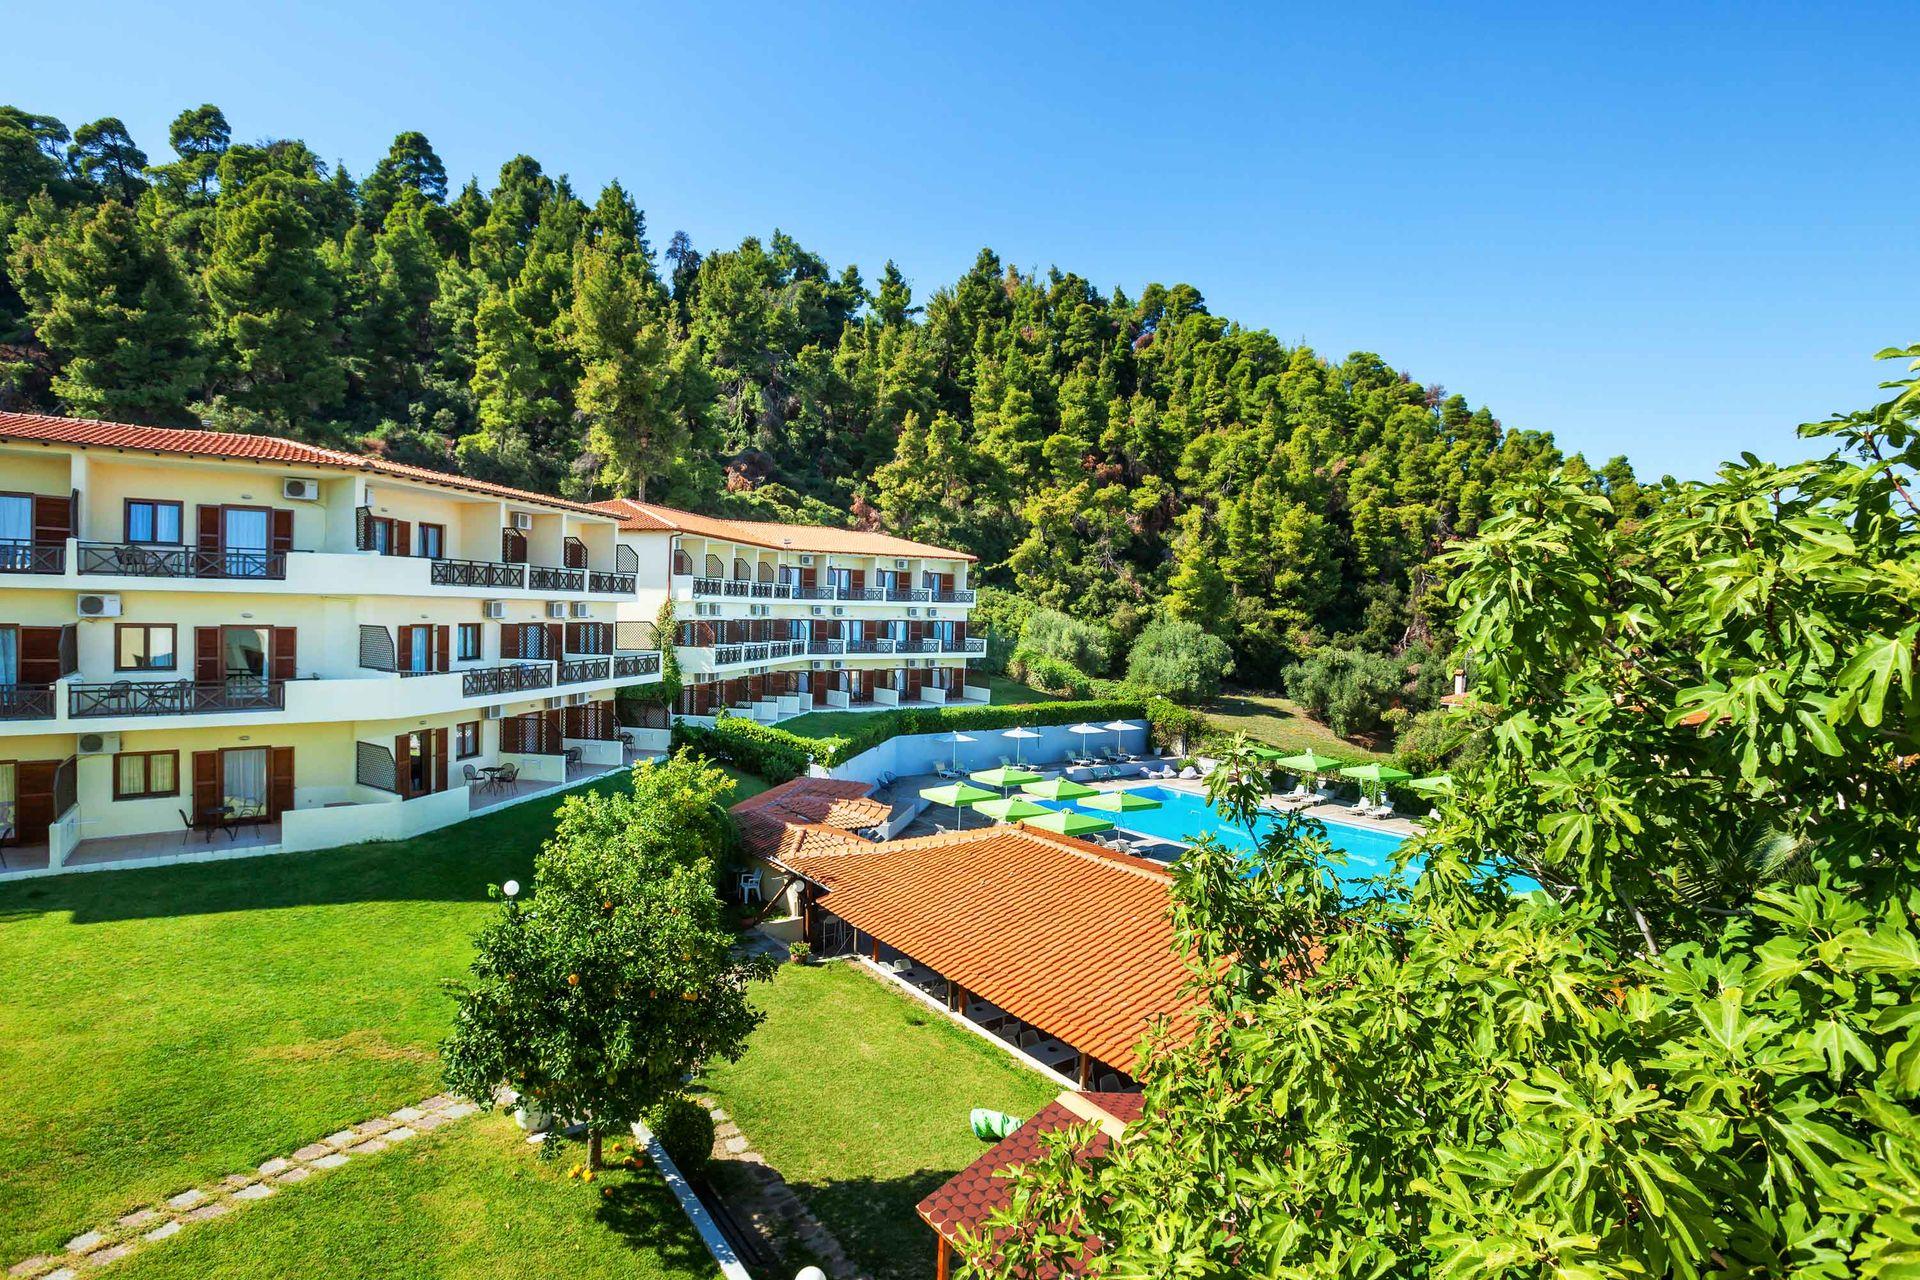 Palladium Hotel - Κρυοπηγή, Χαλκιδική ✦ -10% ✦ 4 Ημέρες (3 Διανυκτερεύσεις) ✦ 2 άτομα ✦ Ημιδιατροφή ✦ 13/09/2021 έως 30/09/2021 ✦ Κοντά στην παραλία!